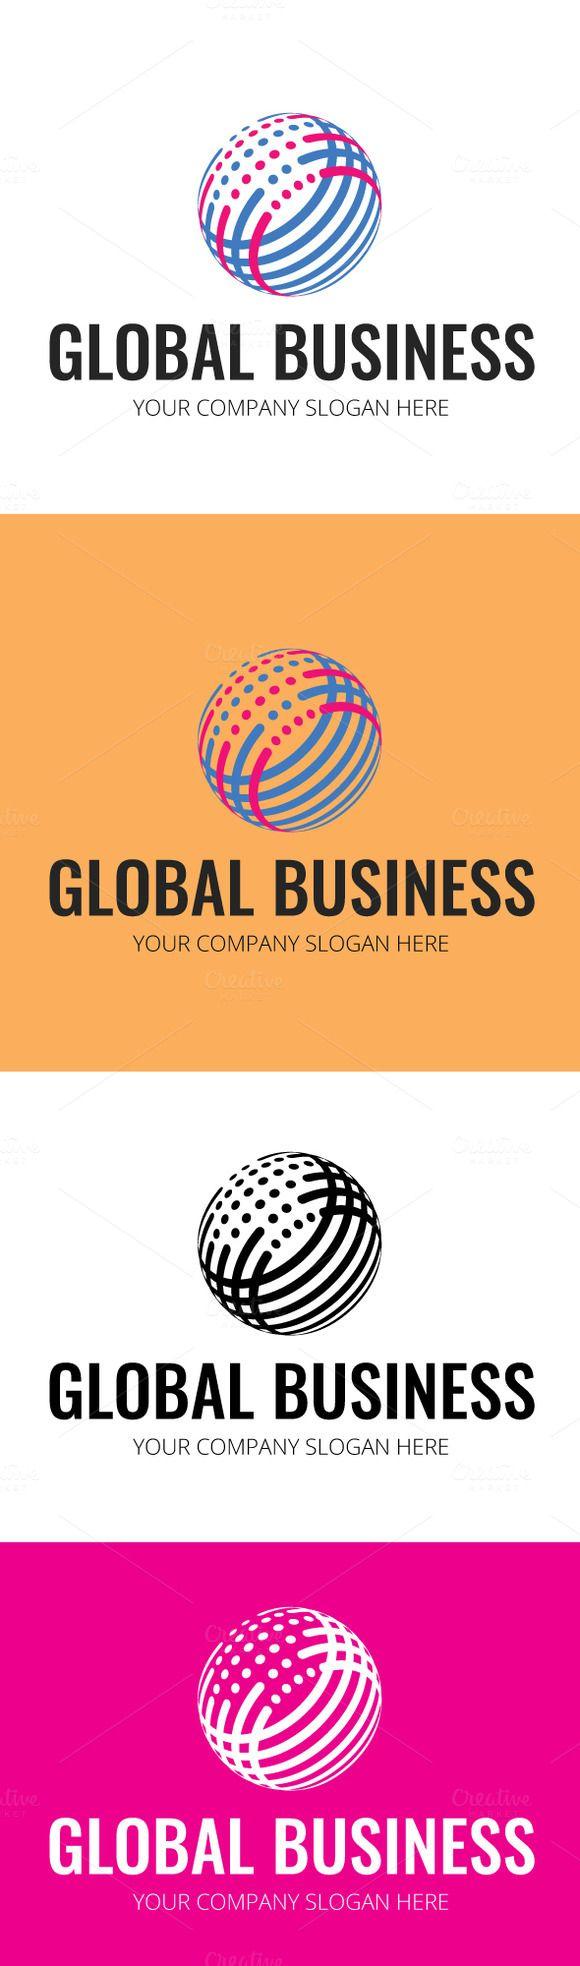 Creative Global Business Logo by DesignMarket on Creative Market